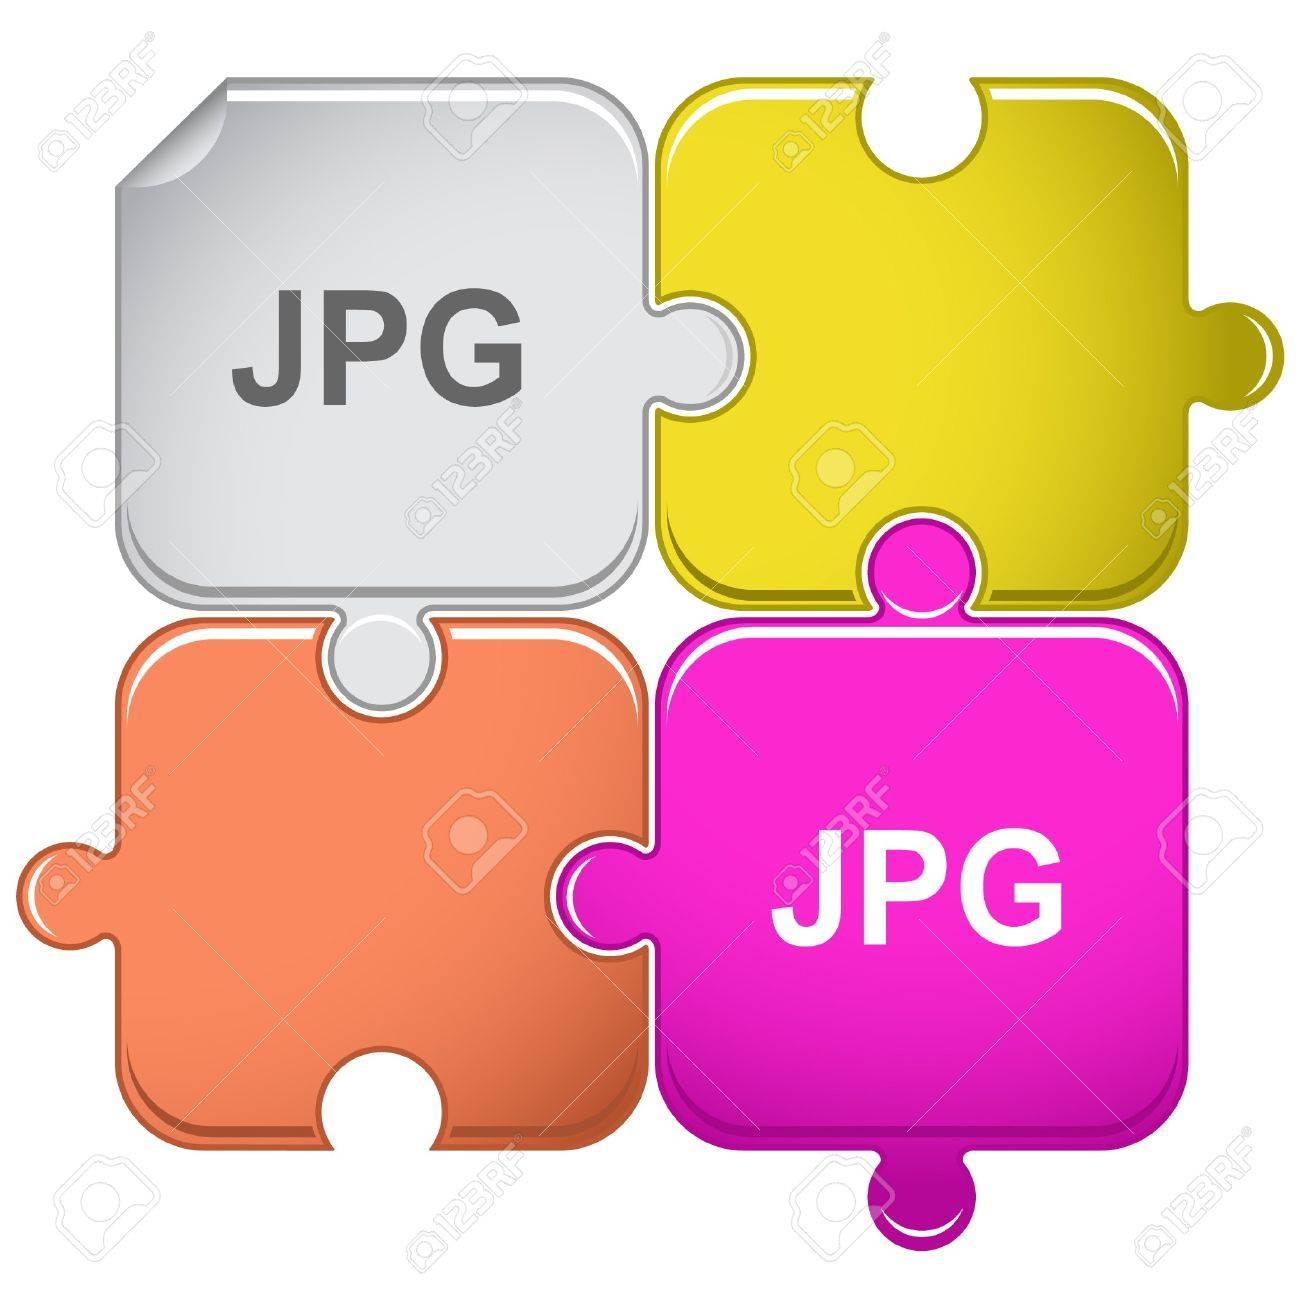 Jpg. puzzle. Stock Vector - 7301854